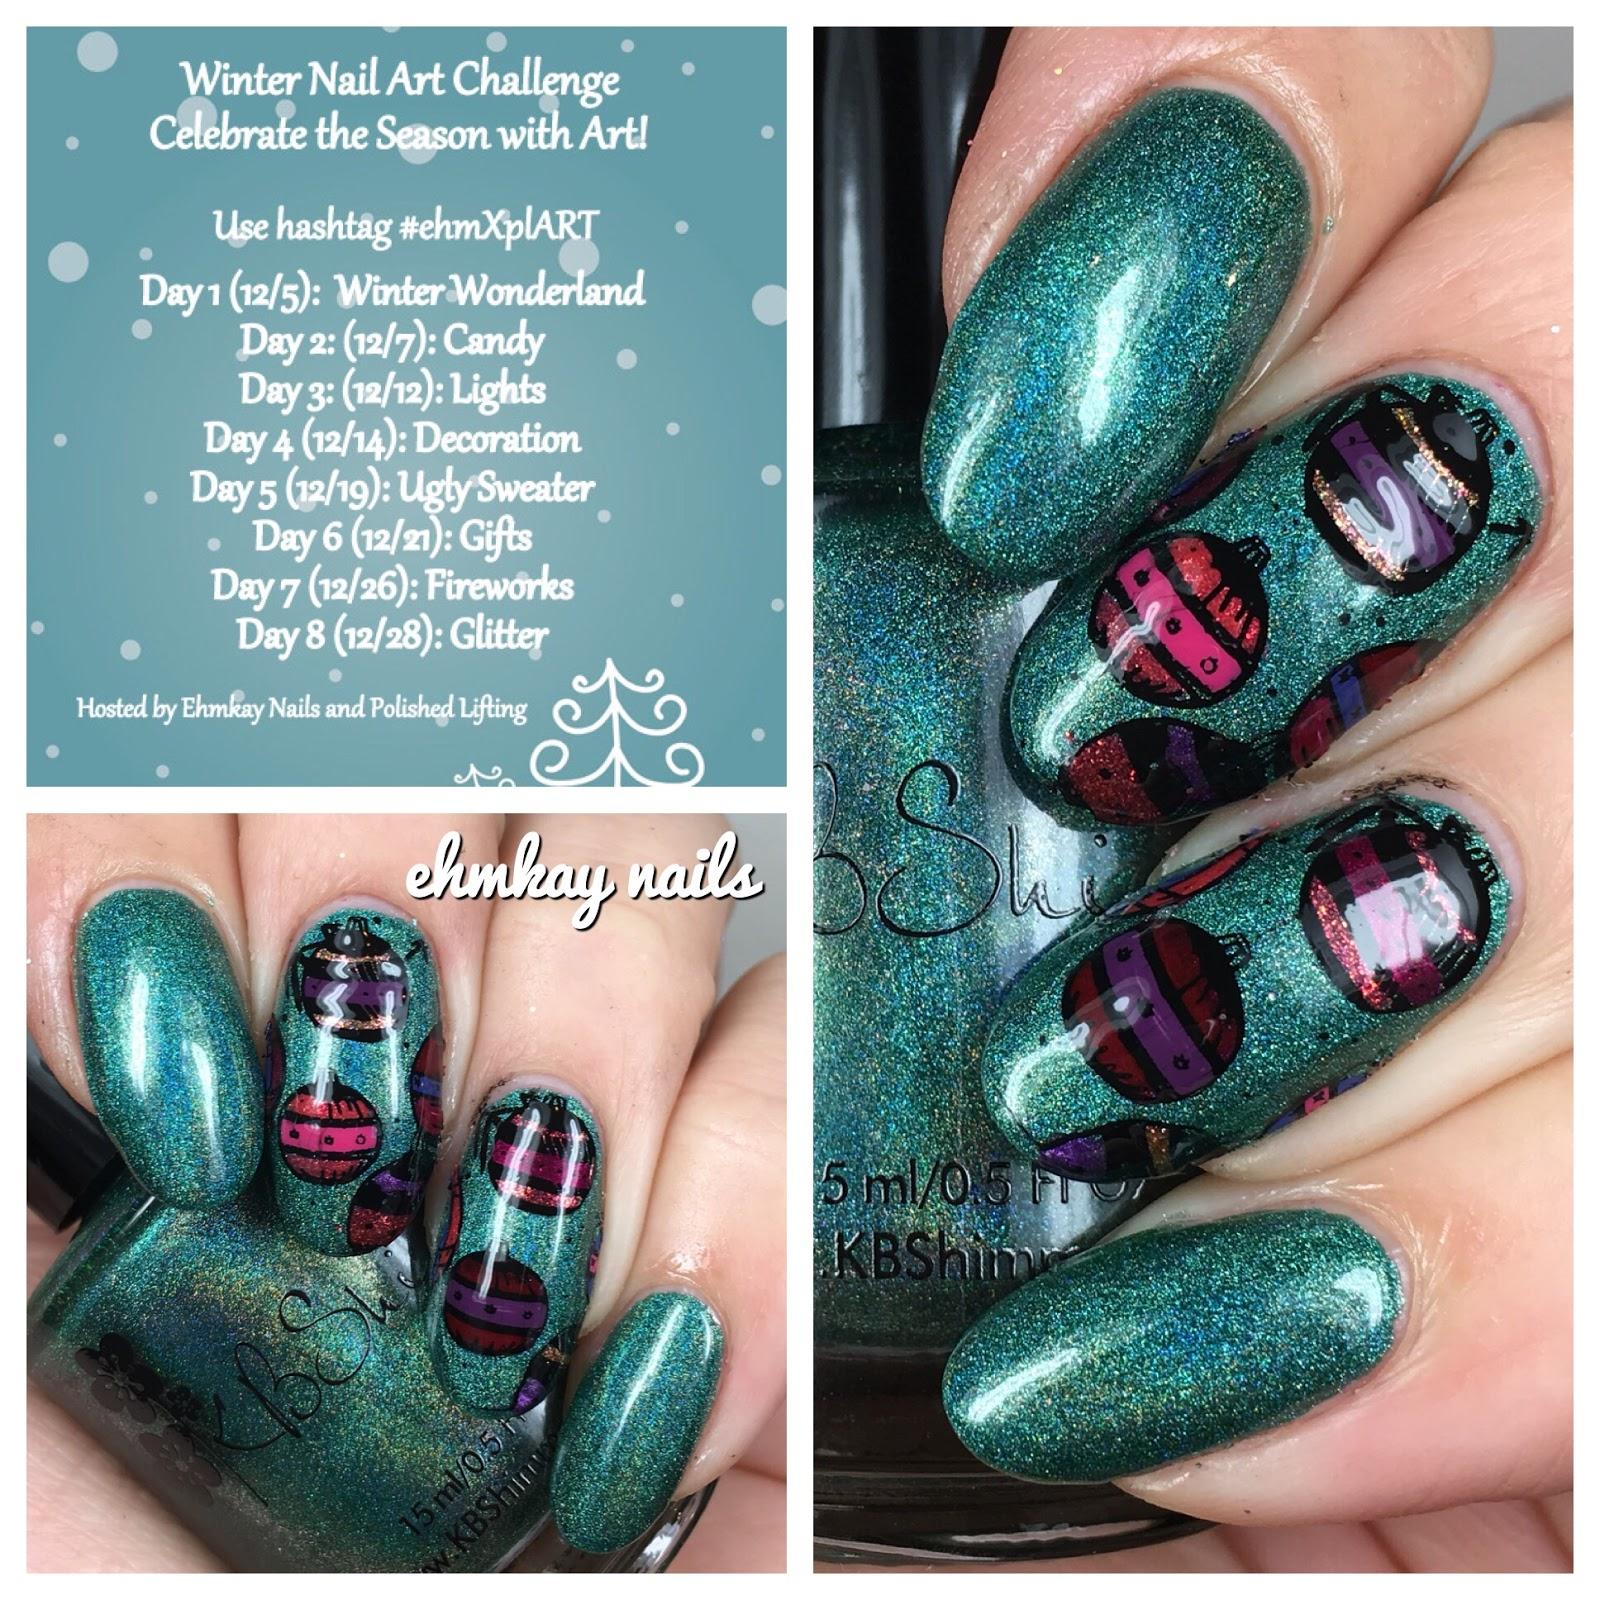 Ehmkay nails winter nail art challenge decorations ornament winter nail art challenge decorations ornament nail art prinsesfo Gallery